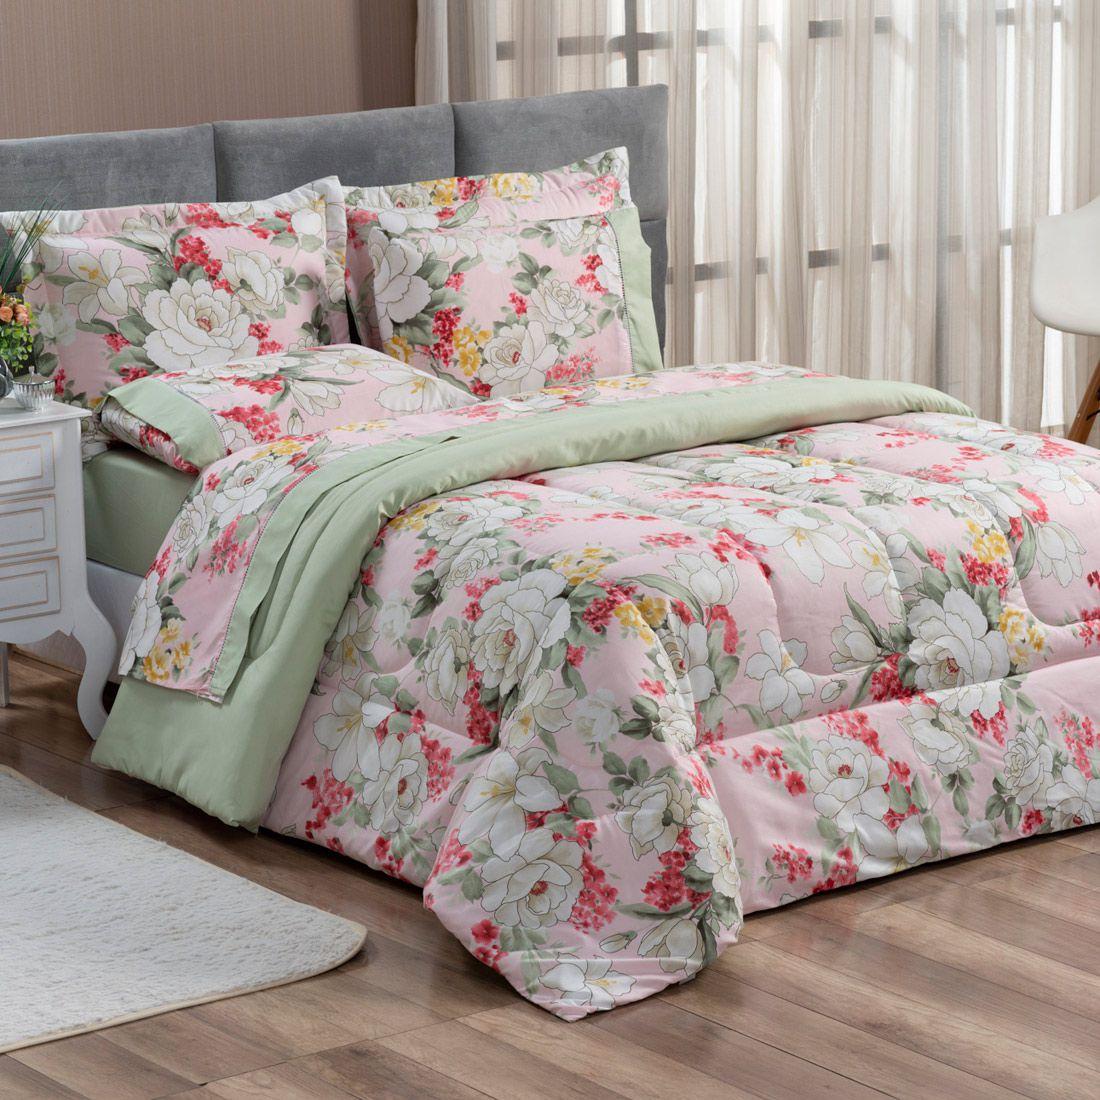 Kit Edredom Forest Floral Verde/Rosê Queen Micropercal 200 Fios Dupla Face 03 Peças